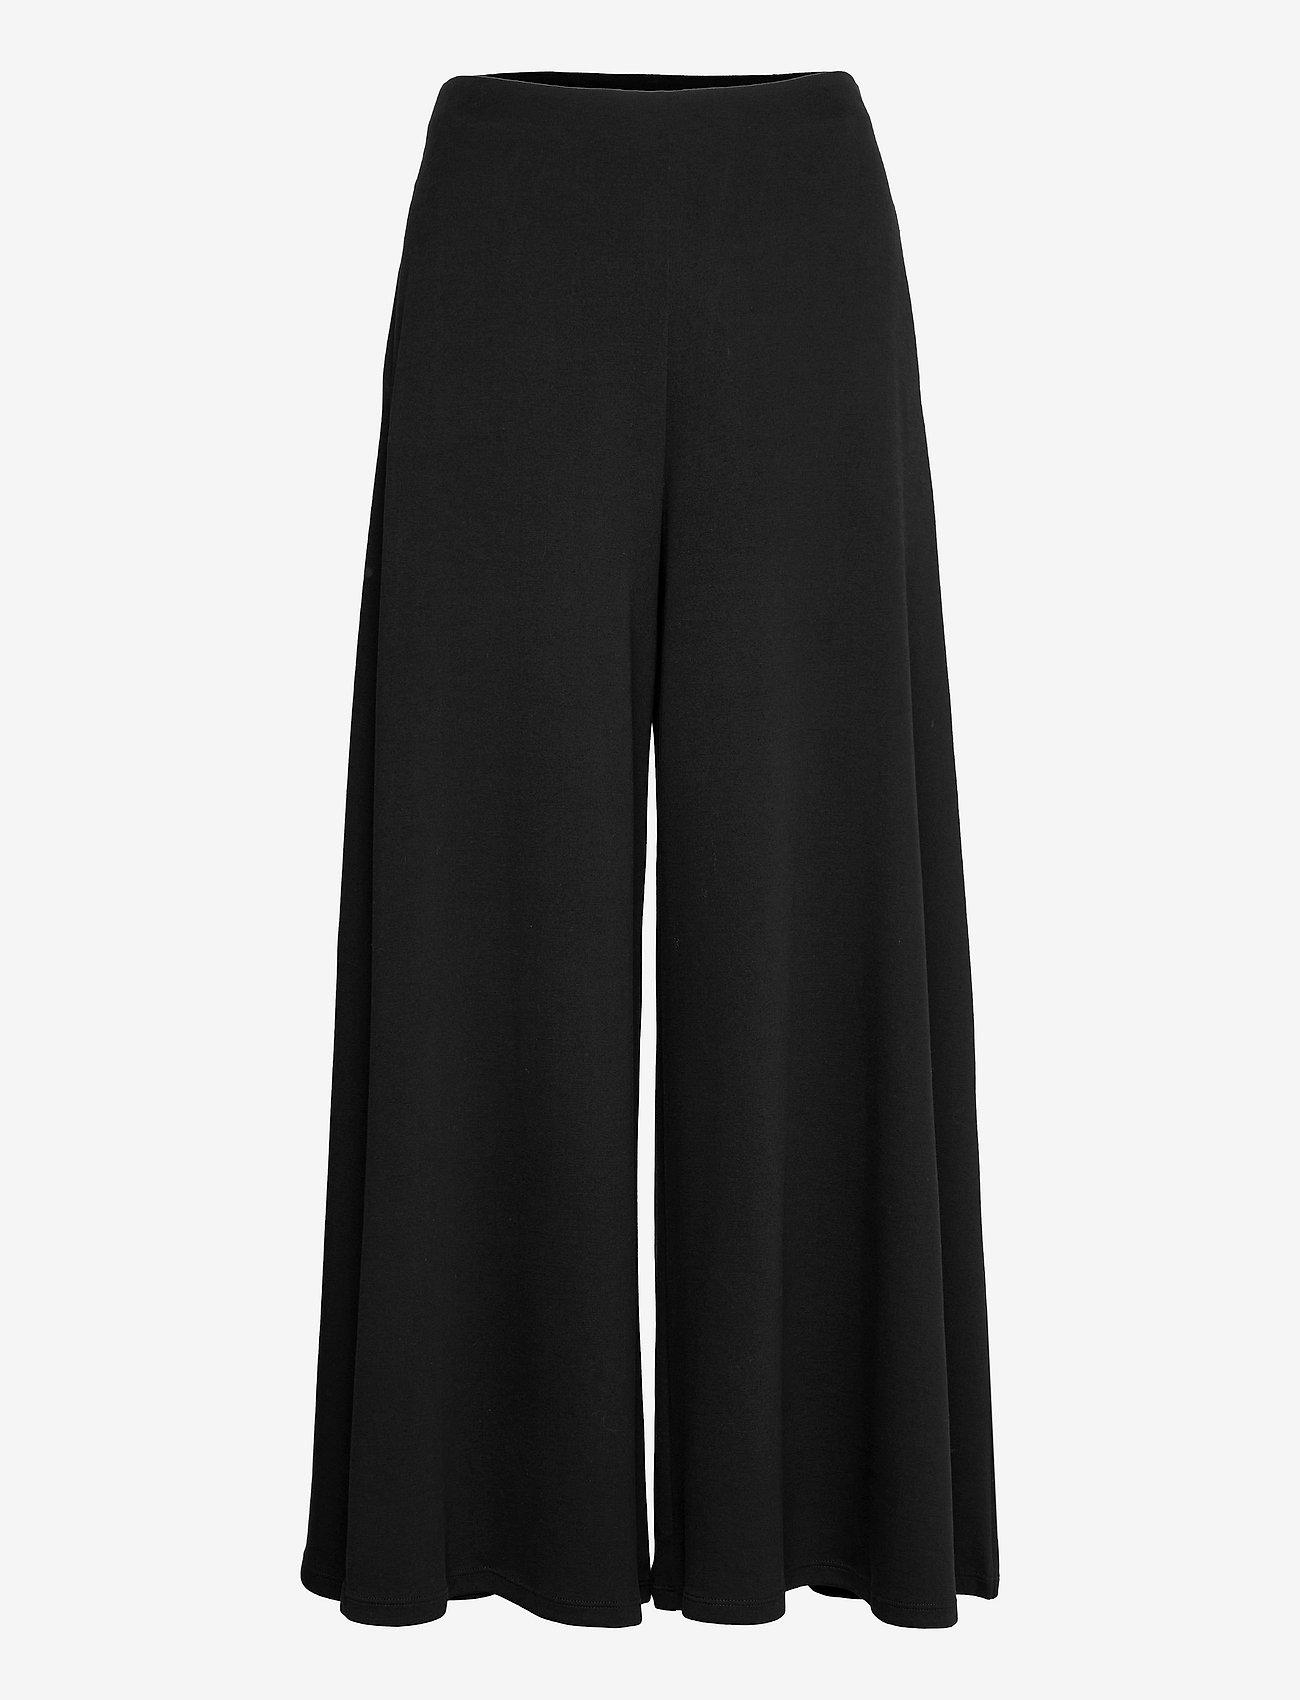 Max Mara Leisure - ESPERIA - wide leg trousers - black - 0